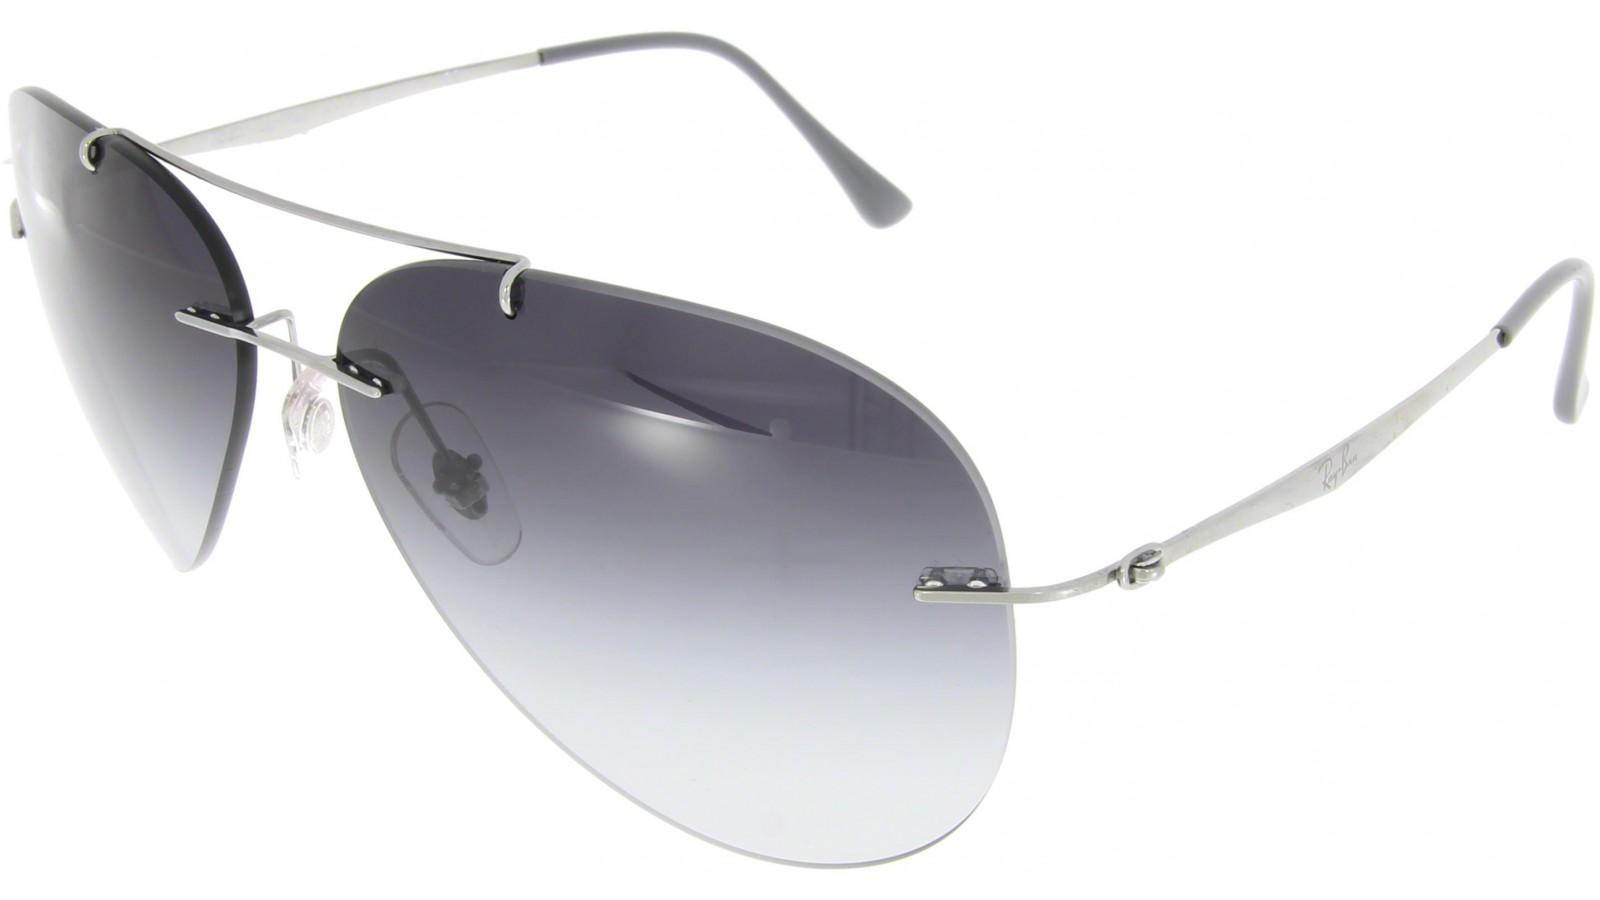 ray ban pilotenbrille light ray rb 8055 1598g3n. Black Bedroom Furniture Sets. Home Design Ideas